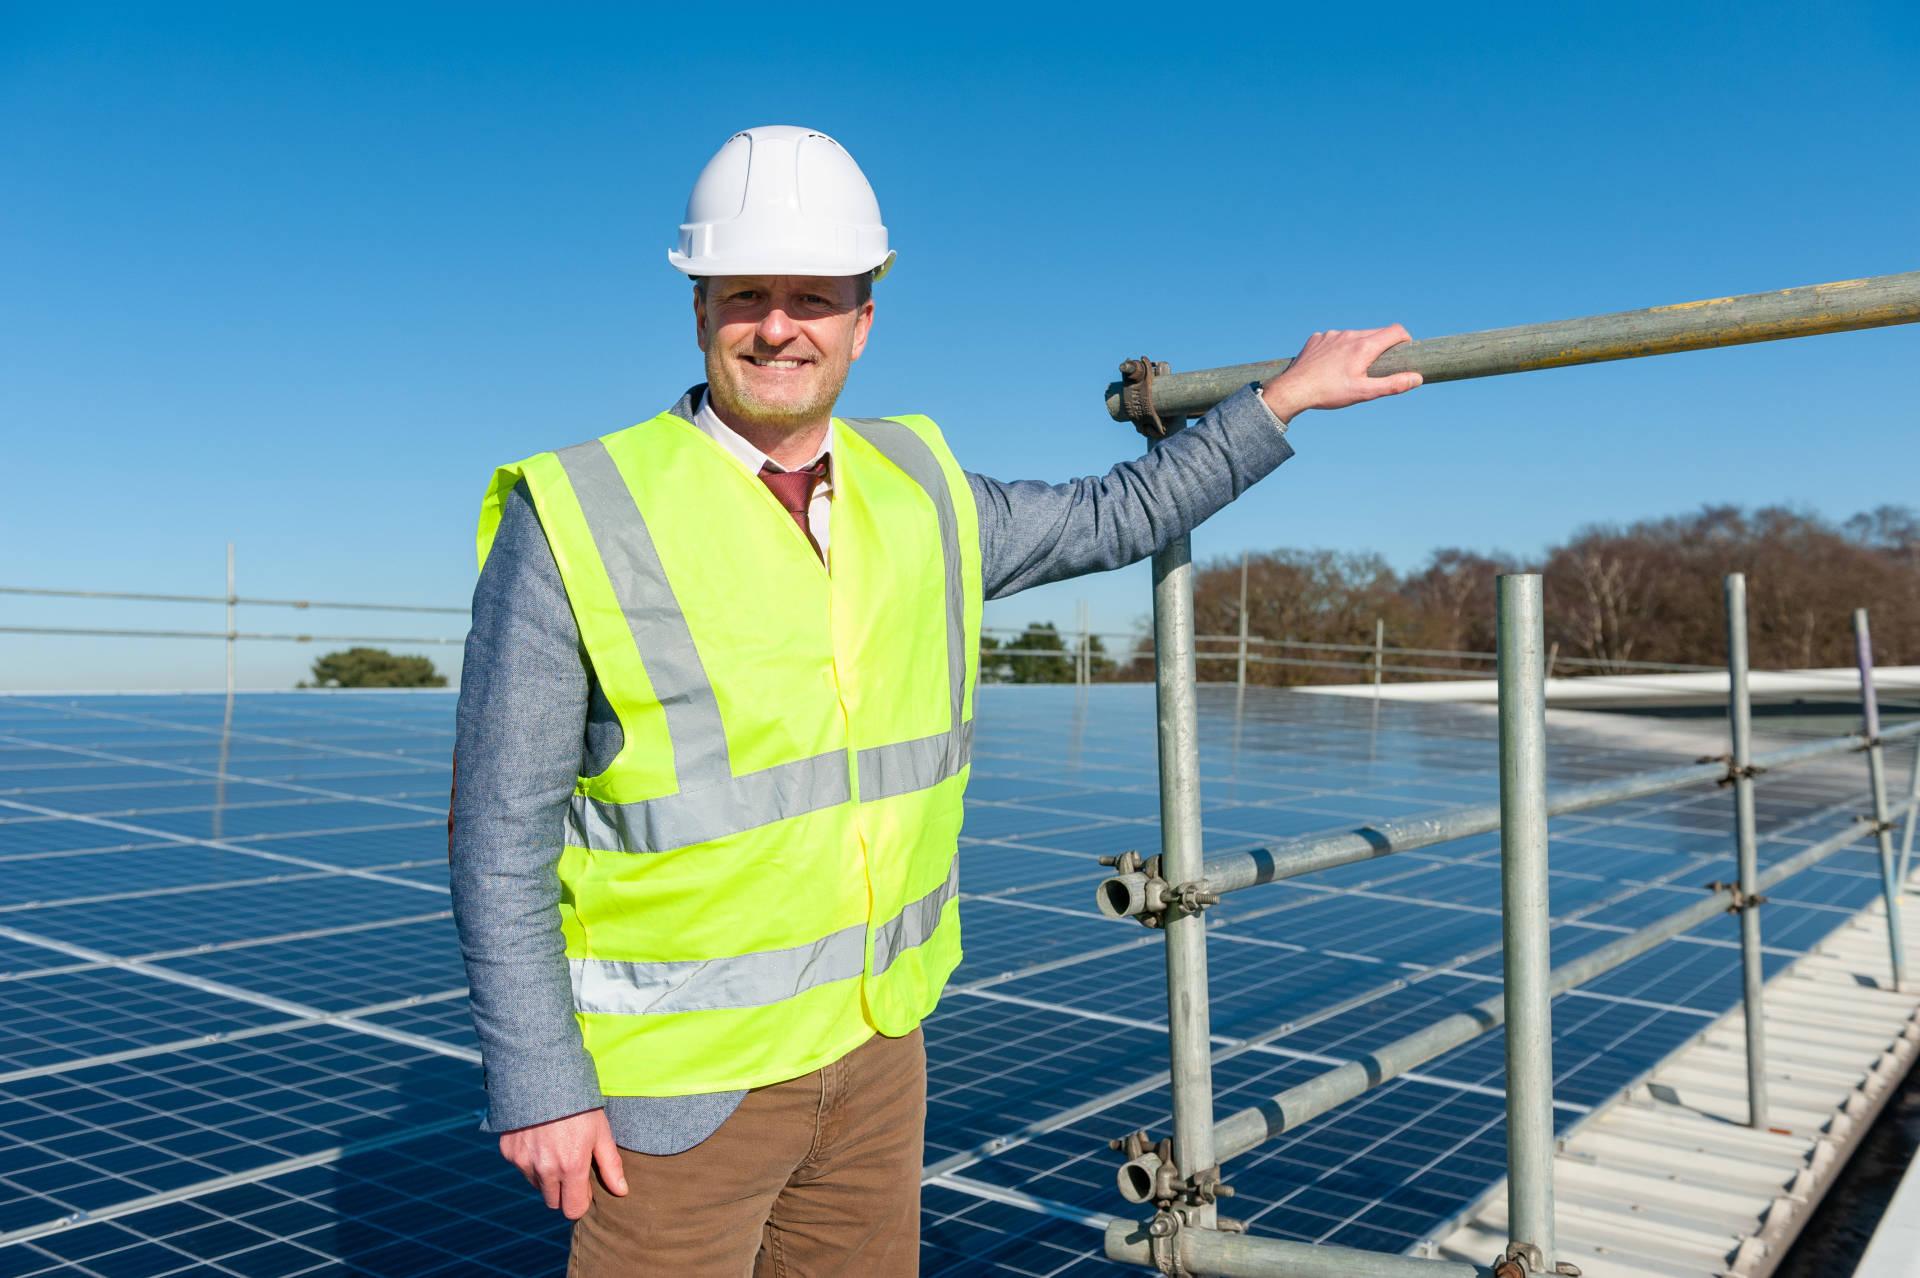 Paul Farrer with Solar Panels